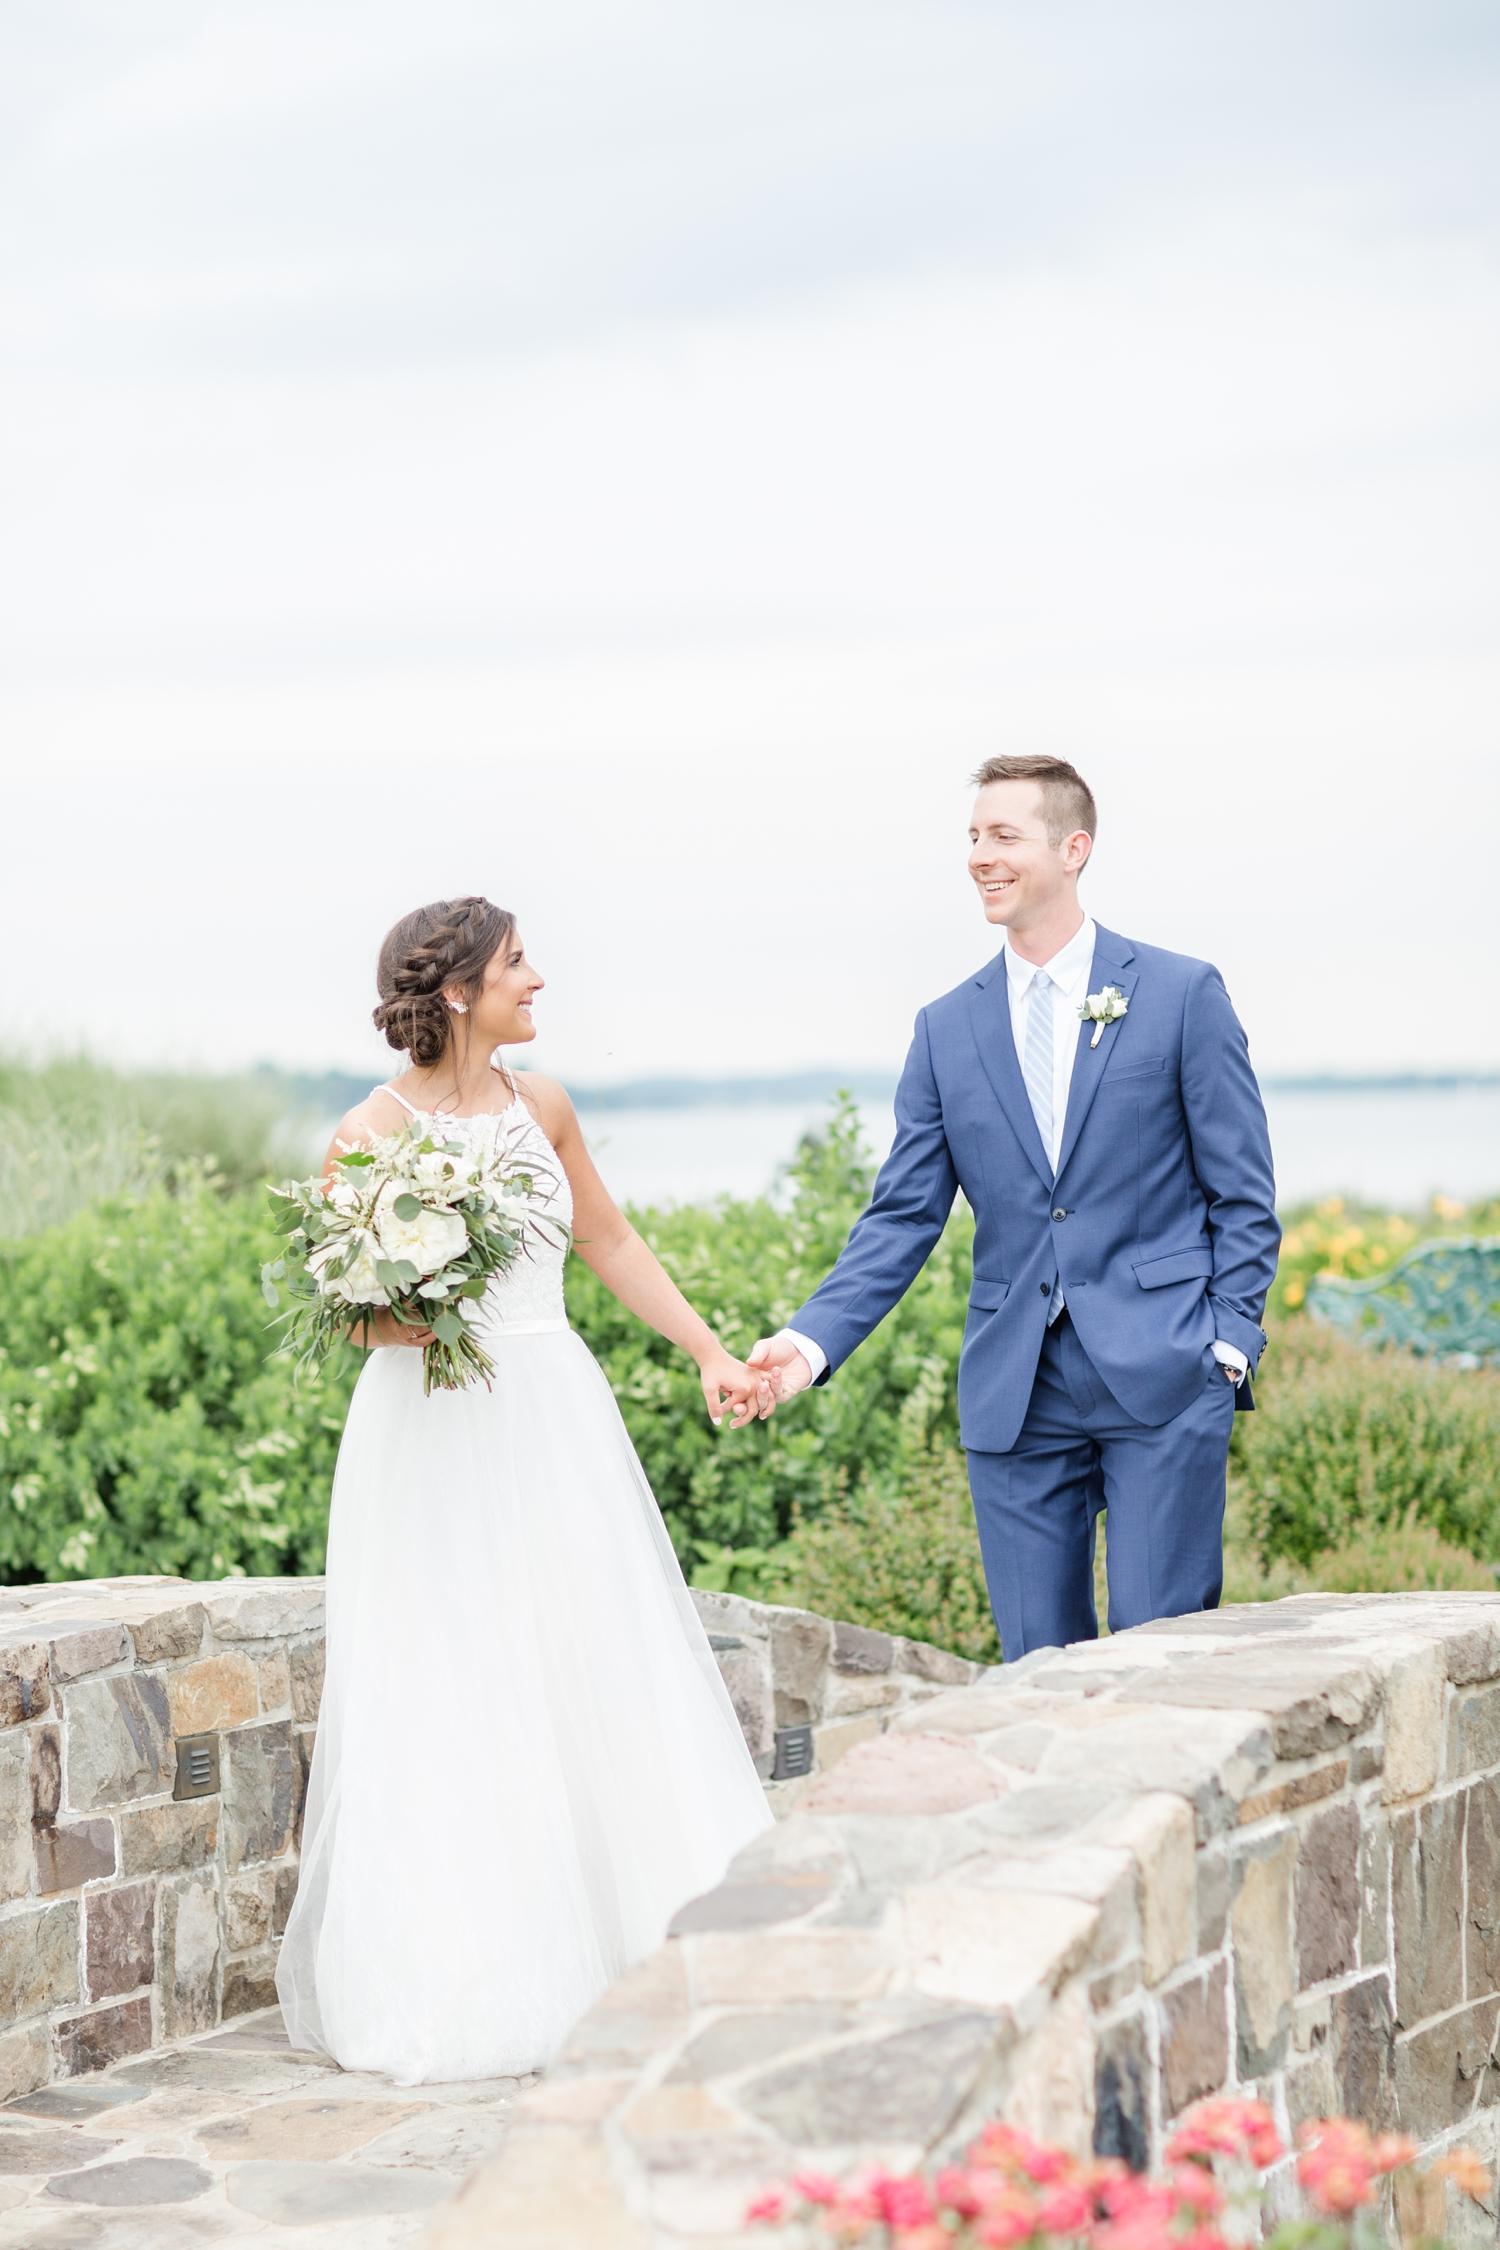 Schindler WEDDING HIGHLIGHTS-187_Herrington-on-the-Bay-wedding-Maryland-wedding-photographer-anna-grace-photography-photo.jpg